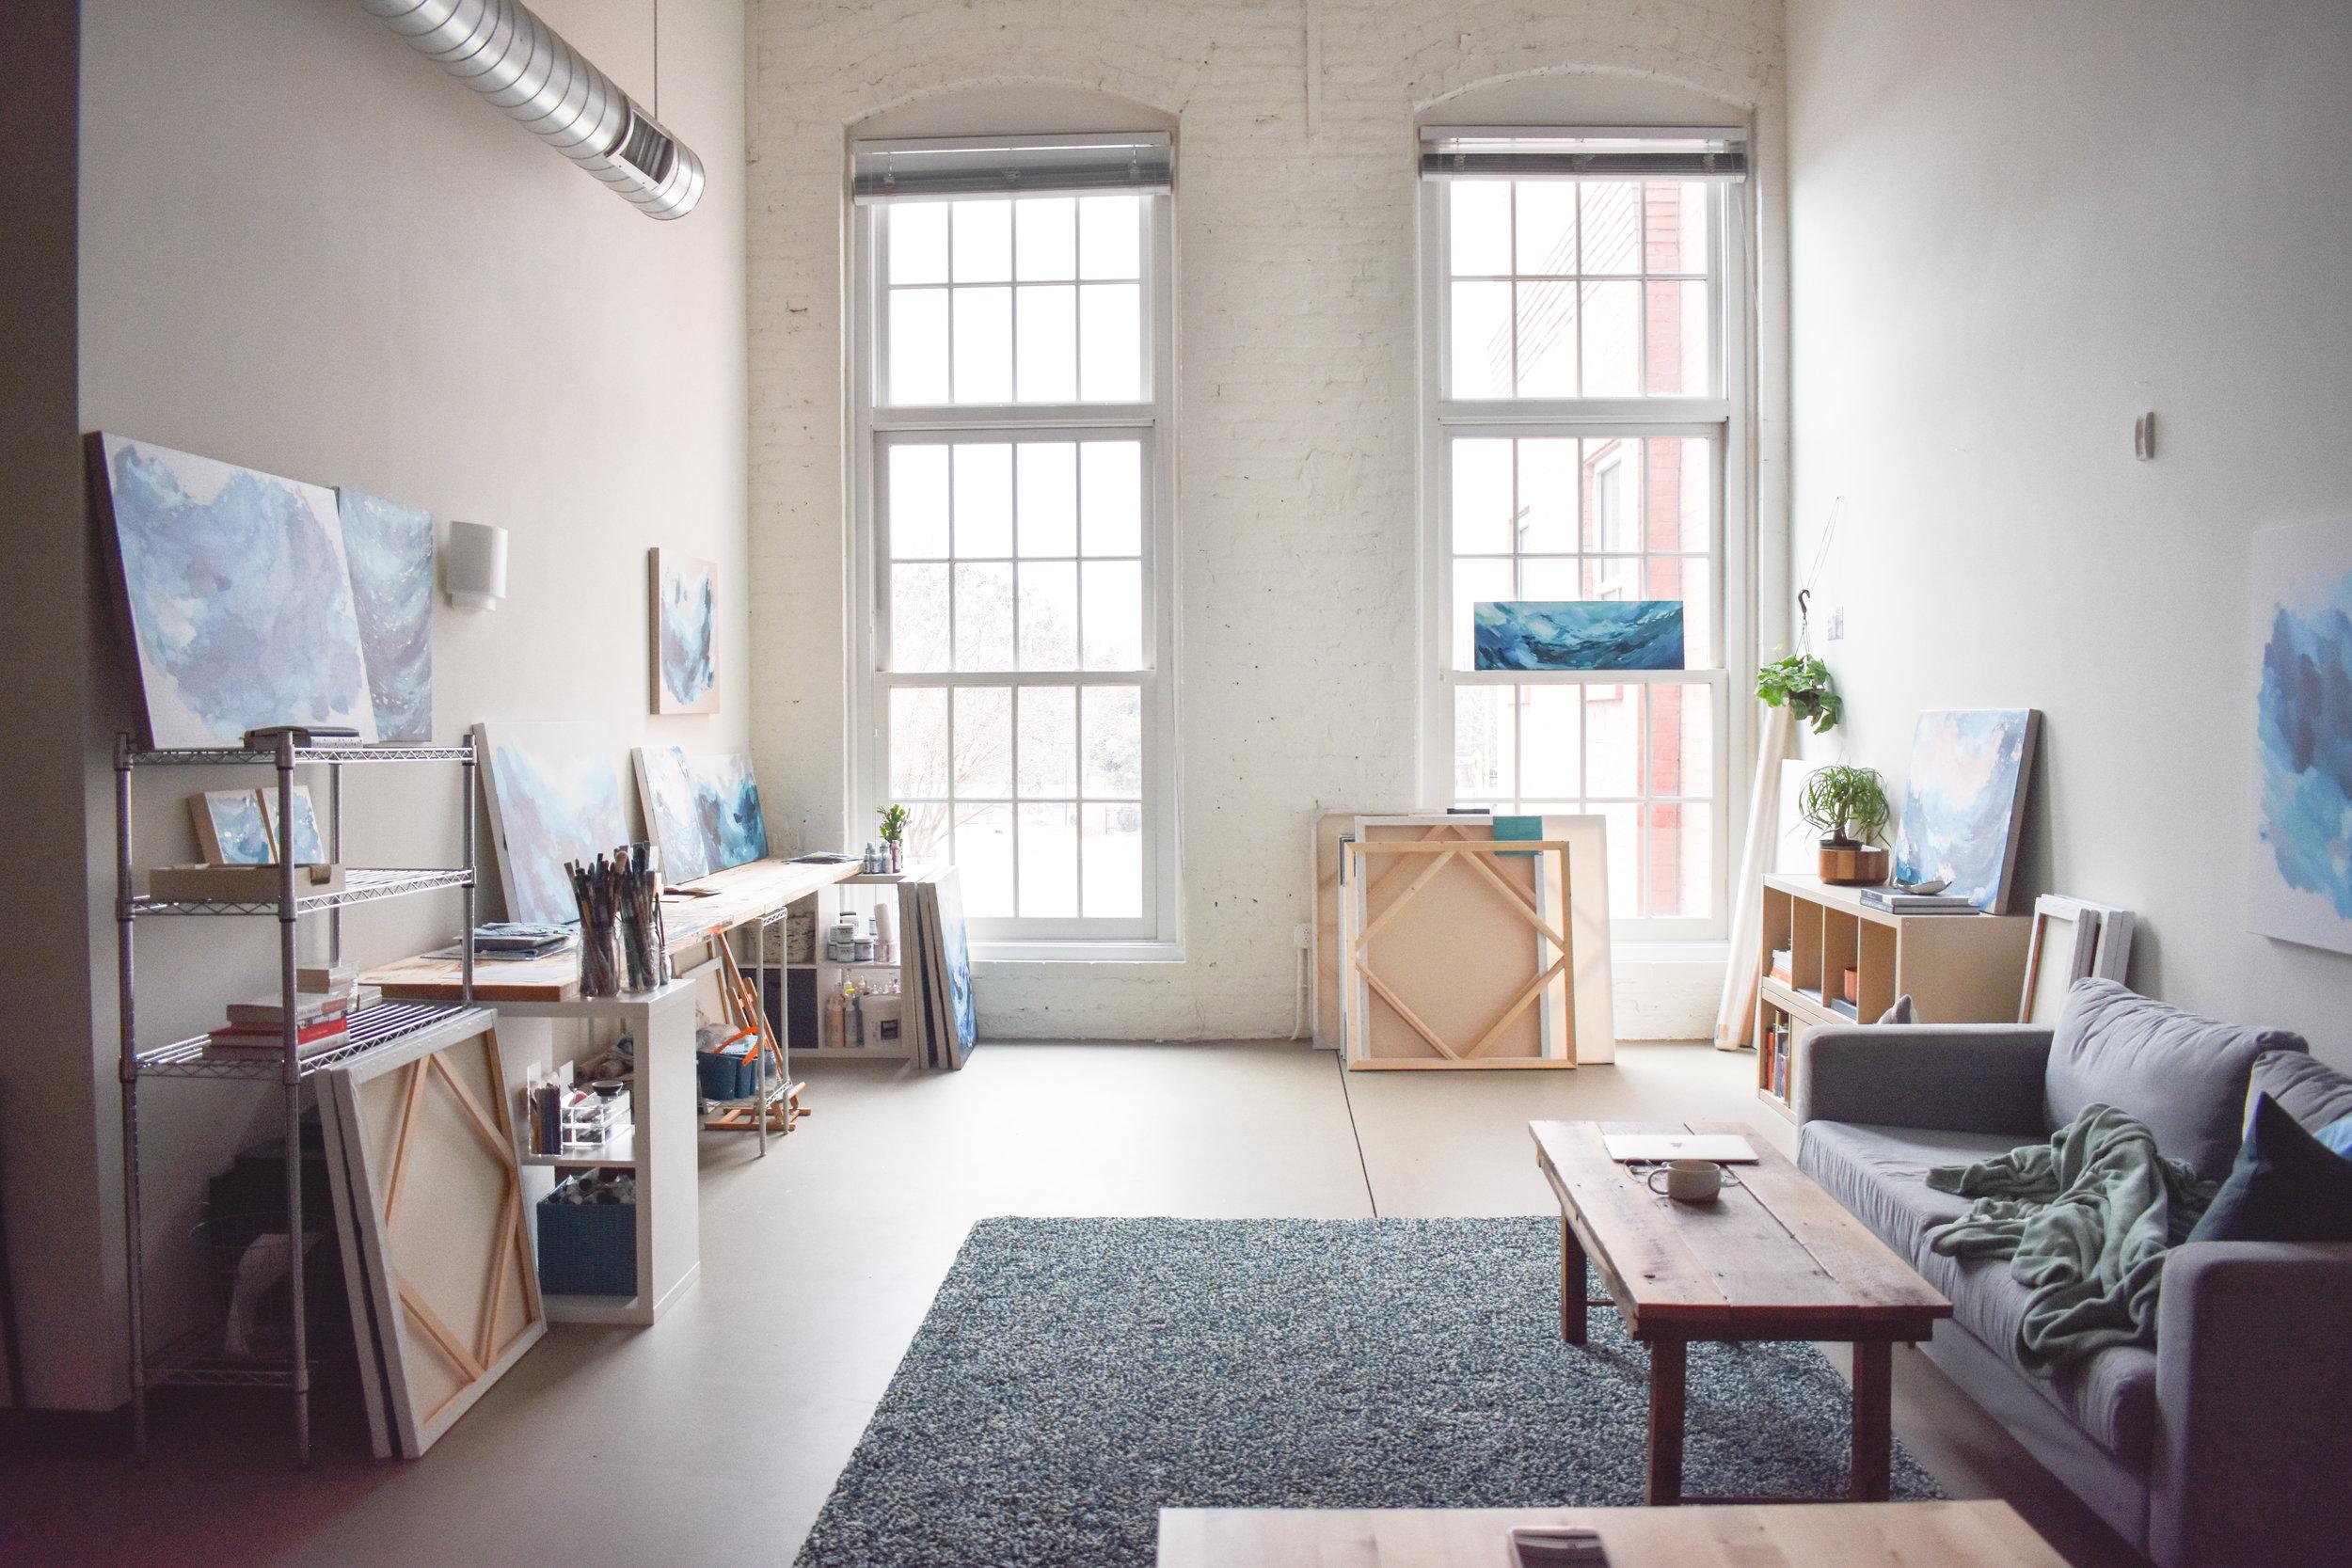 Where Makers Make_Taylor_Lee_Art Studio Tour_1.jpg